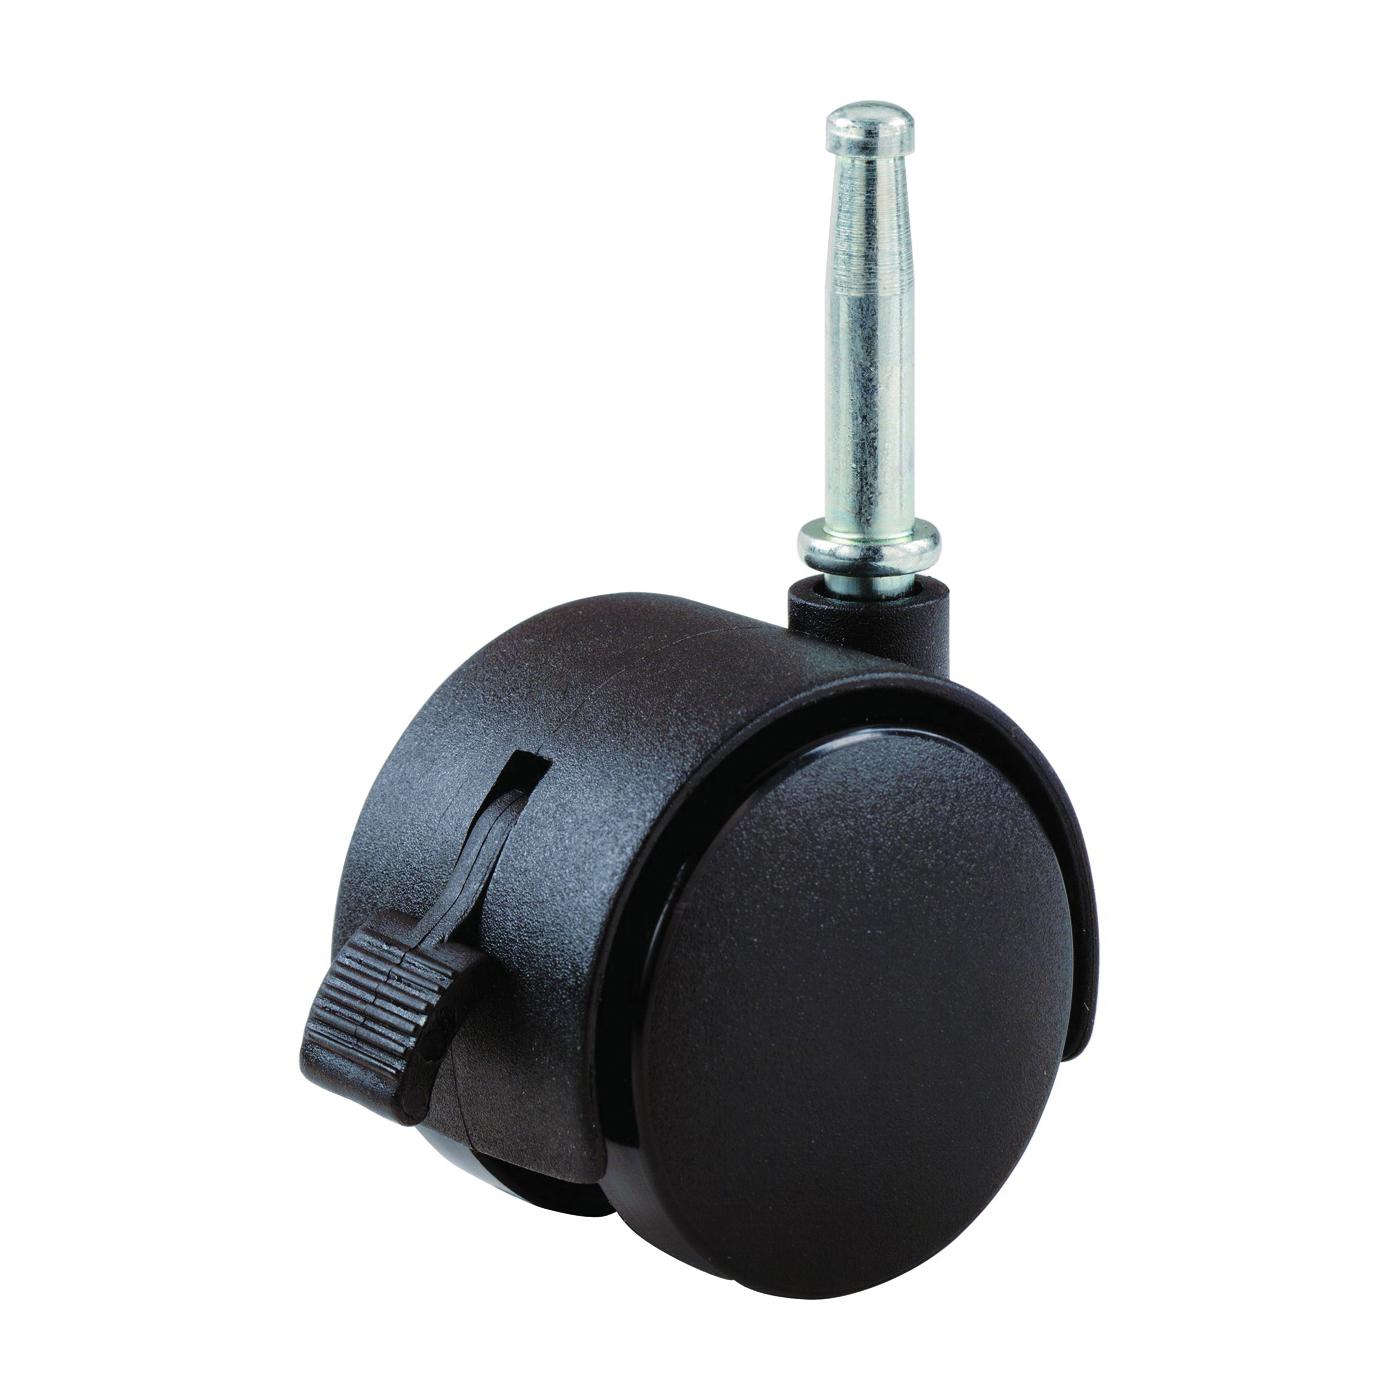 Picture of Shepherd Hardware 9406 Swivel Caster with Brake, 2 in Dia Wheel, Nylon Wheel, Black, 75 lb